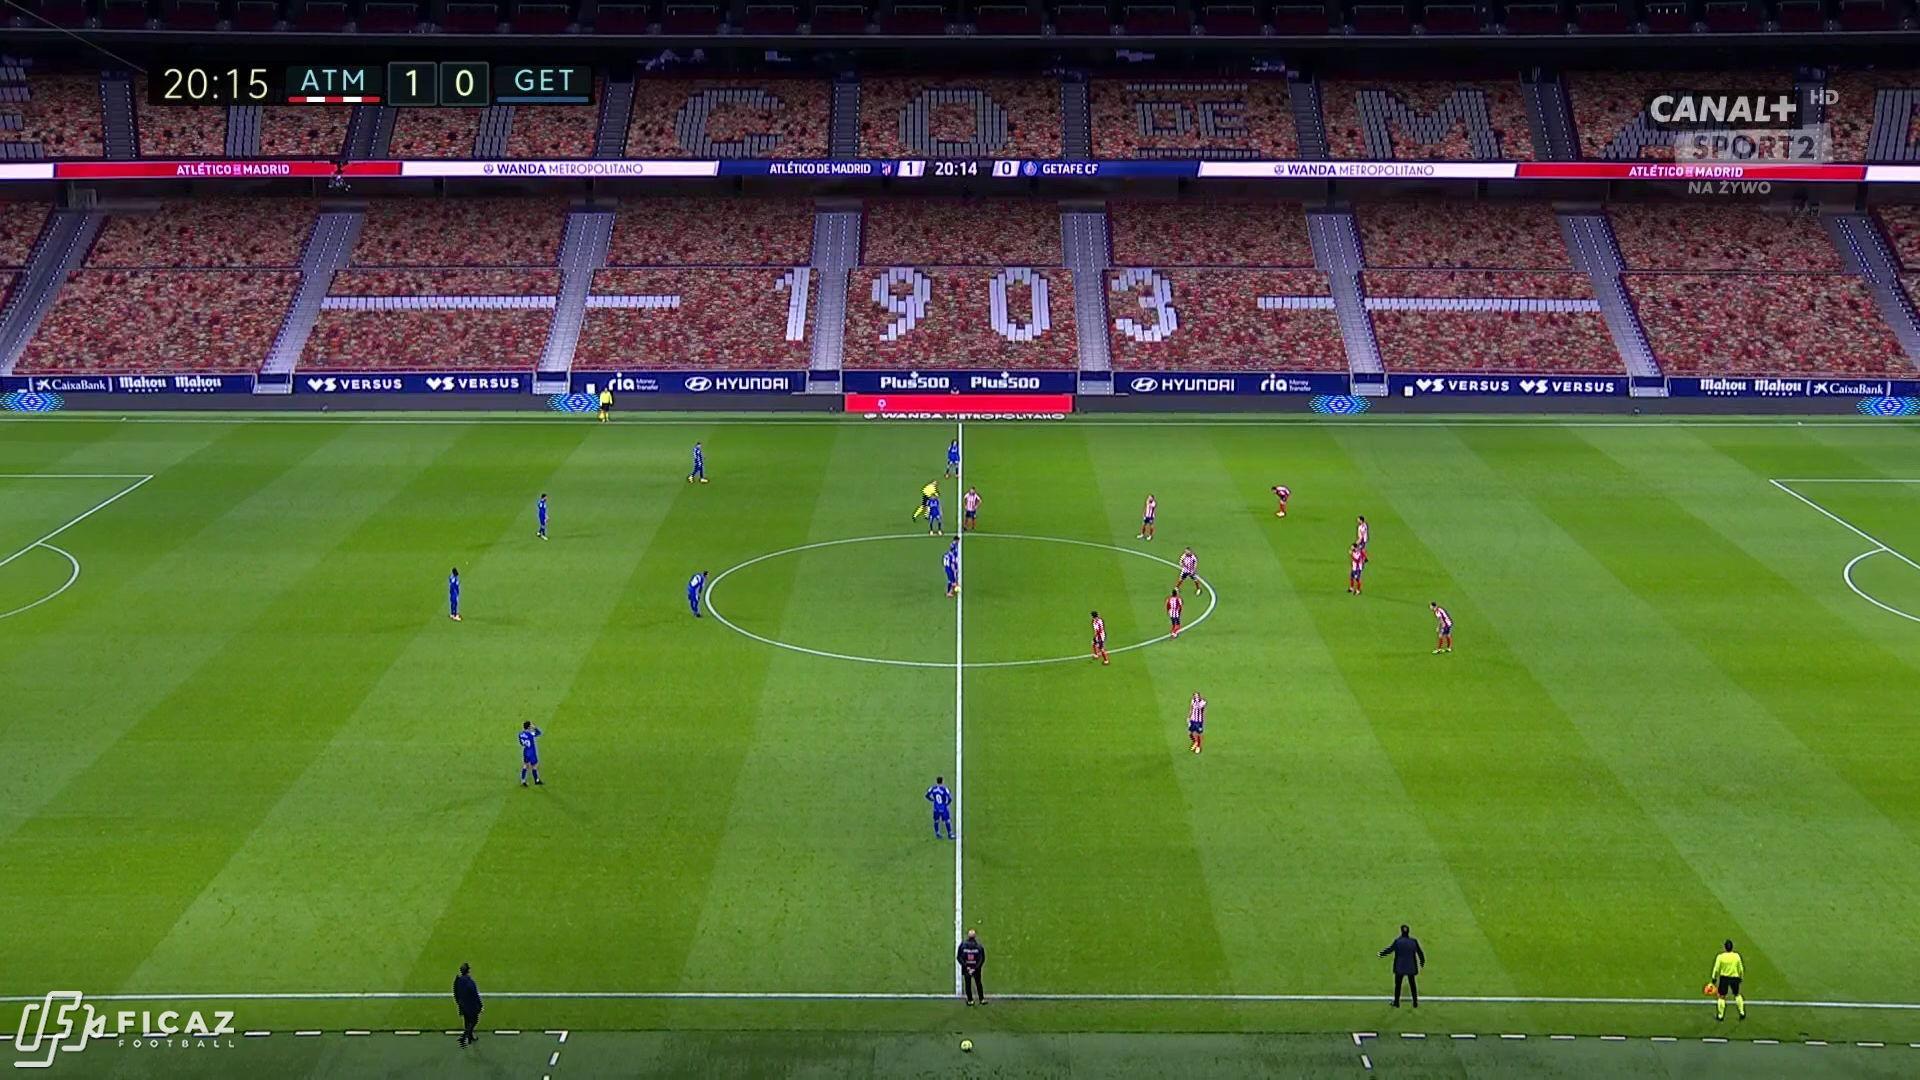 Atlético Madrid - Main